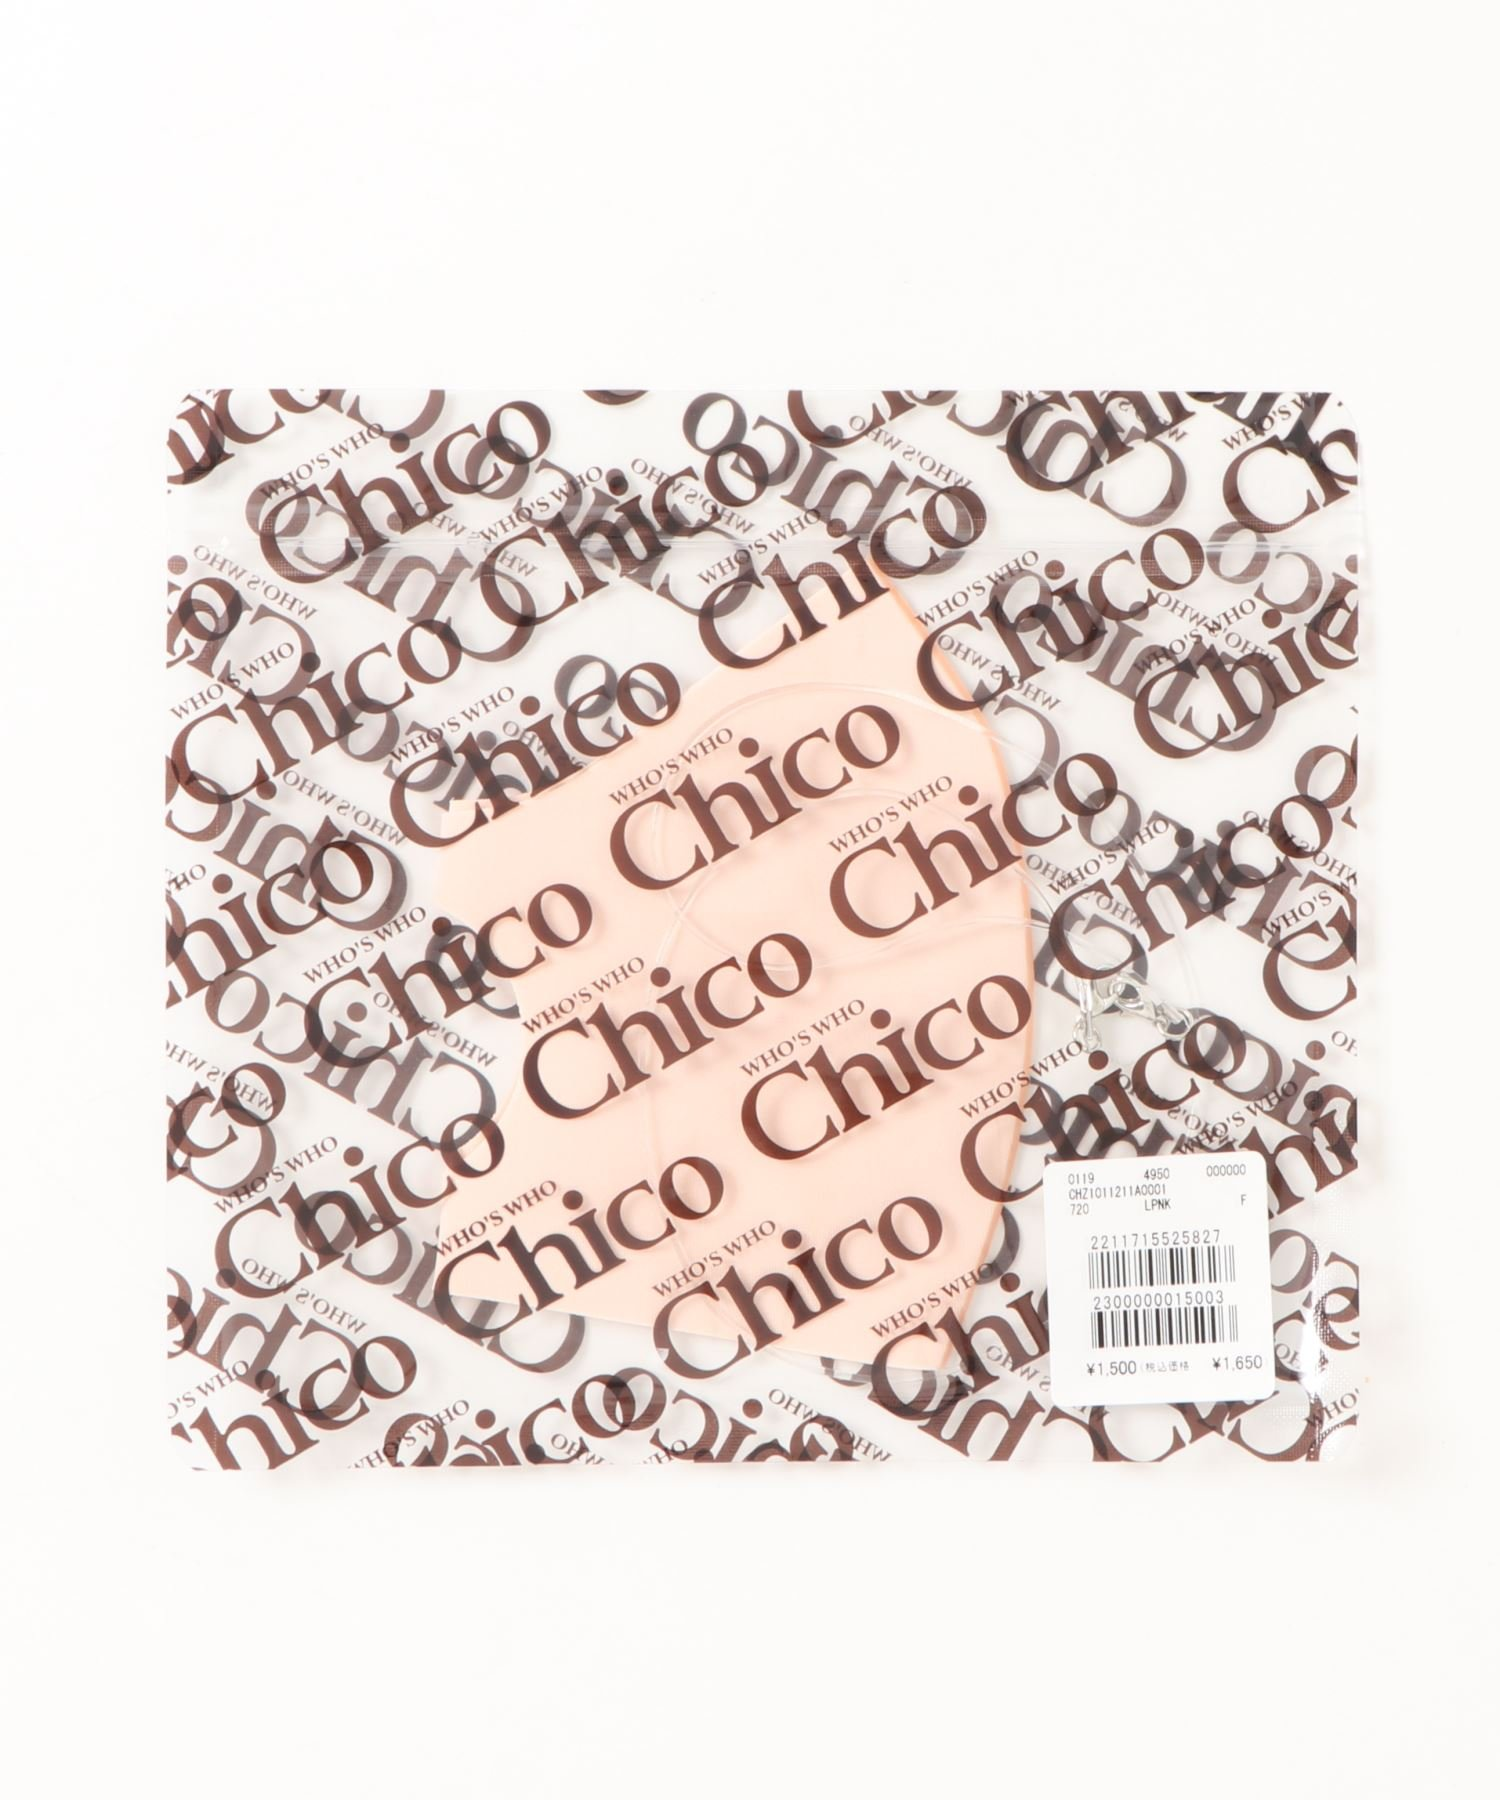 who's who Chico(フーズフーチコ) レディース ストラップ付ファンデーションマスク ベビーピンク